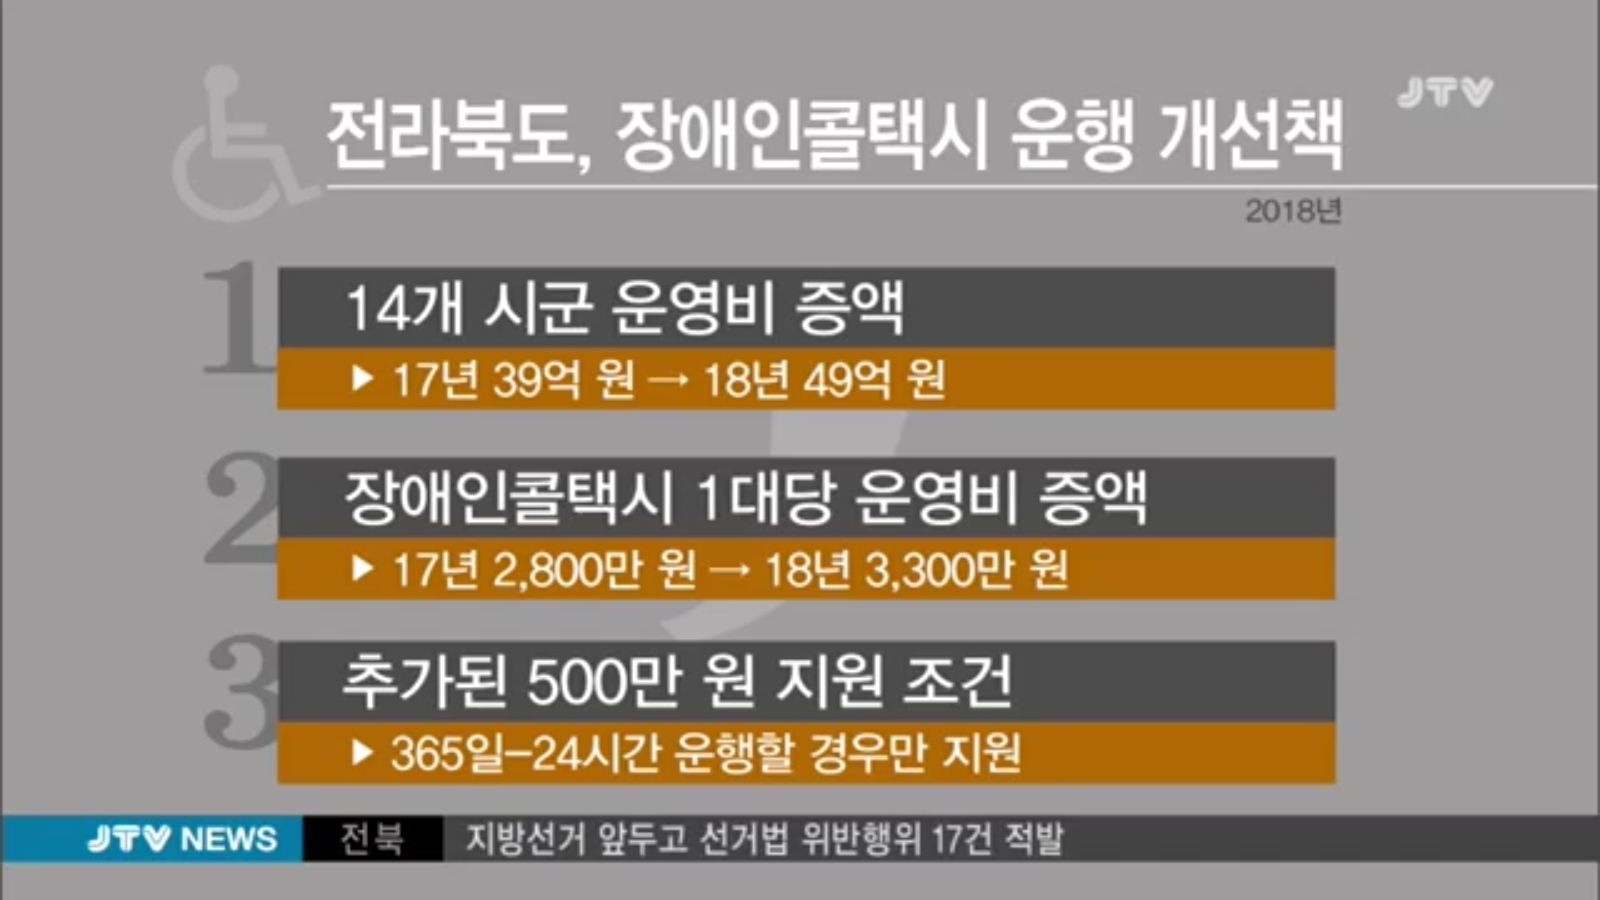 [18.1.25 JTV] 전북도, 356일 24시간 장애인콜택시 운영키로2.jpg